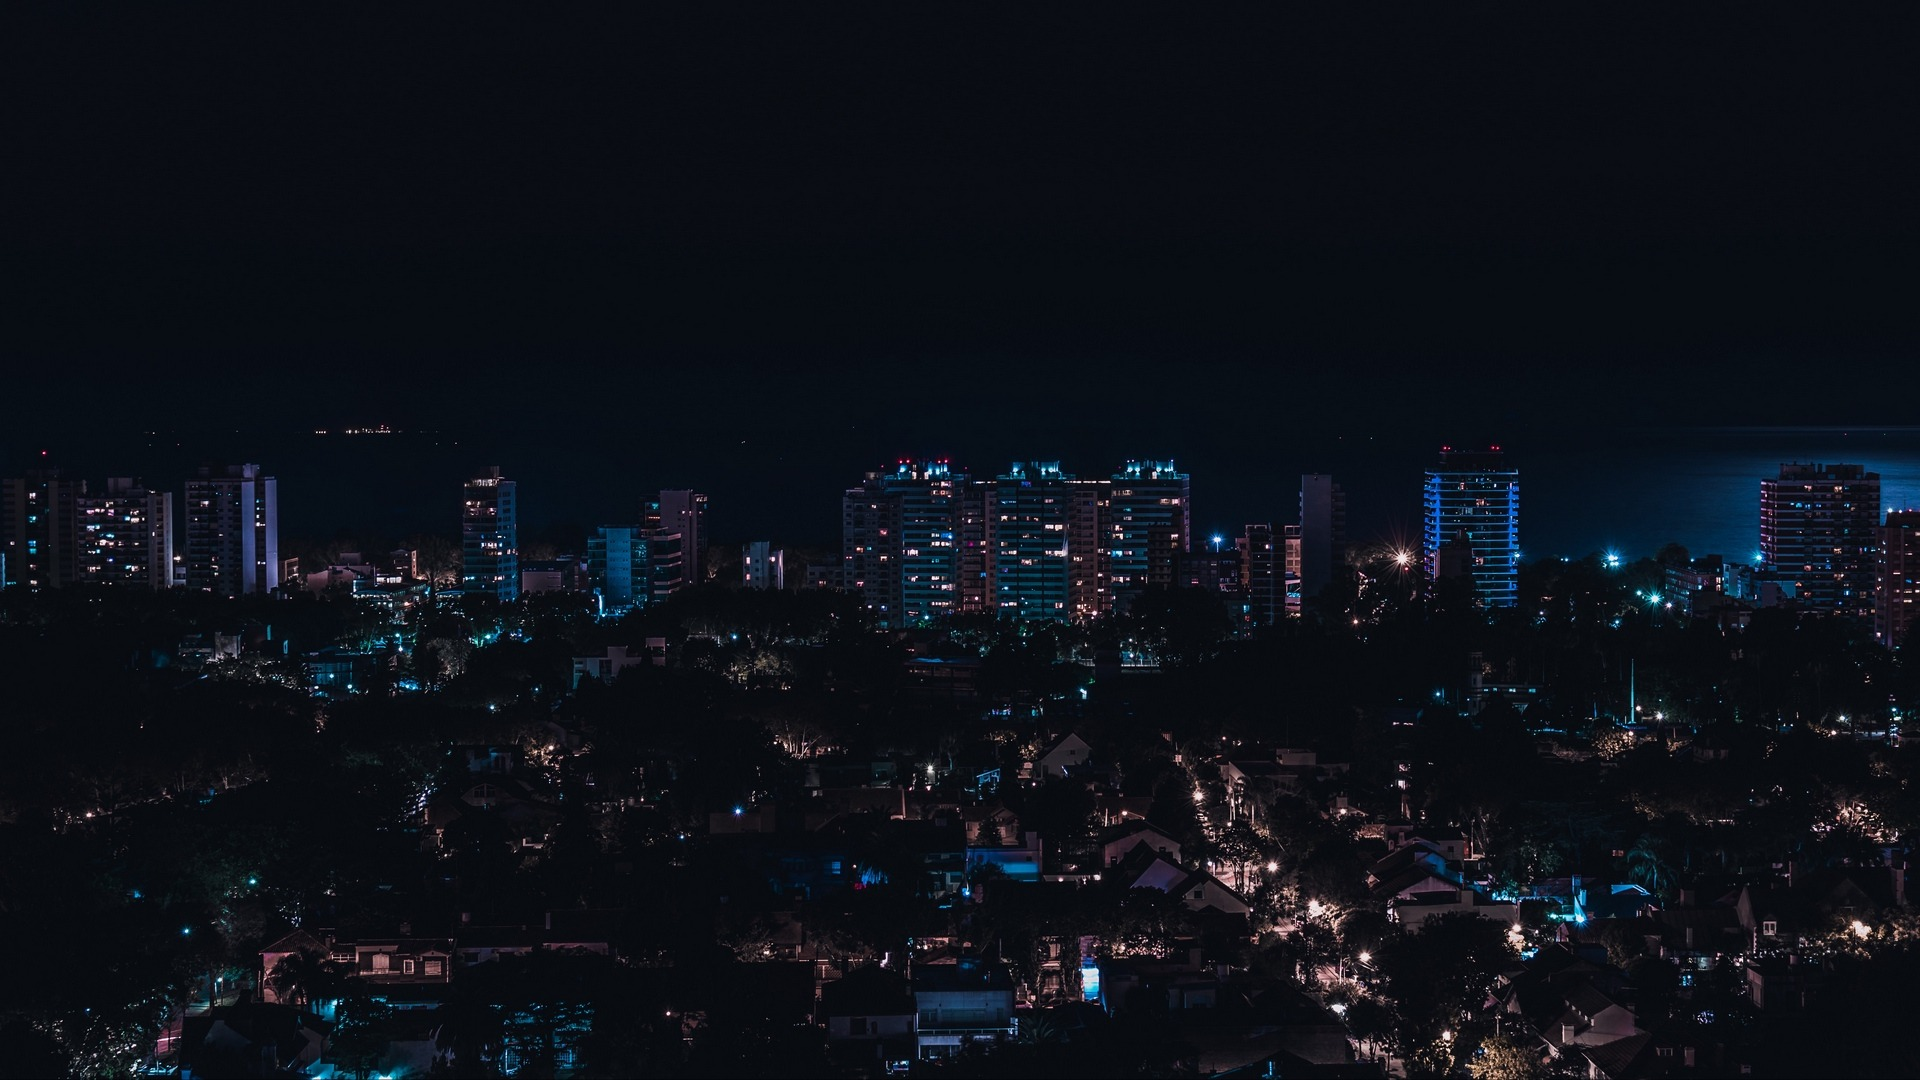 /var/www/html/wp-content/uploads/2018/09/olivos_argentina_night_city_buildings_city_lights_119865_1920x1080-1